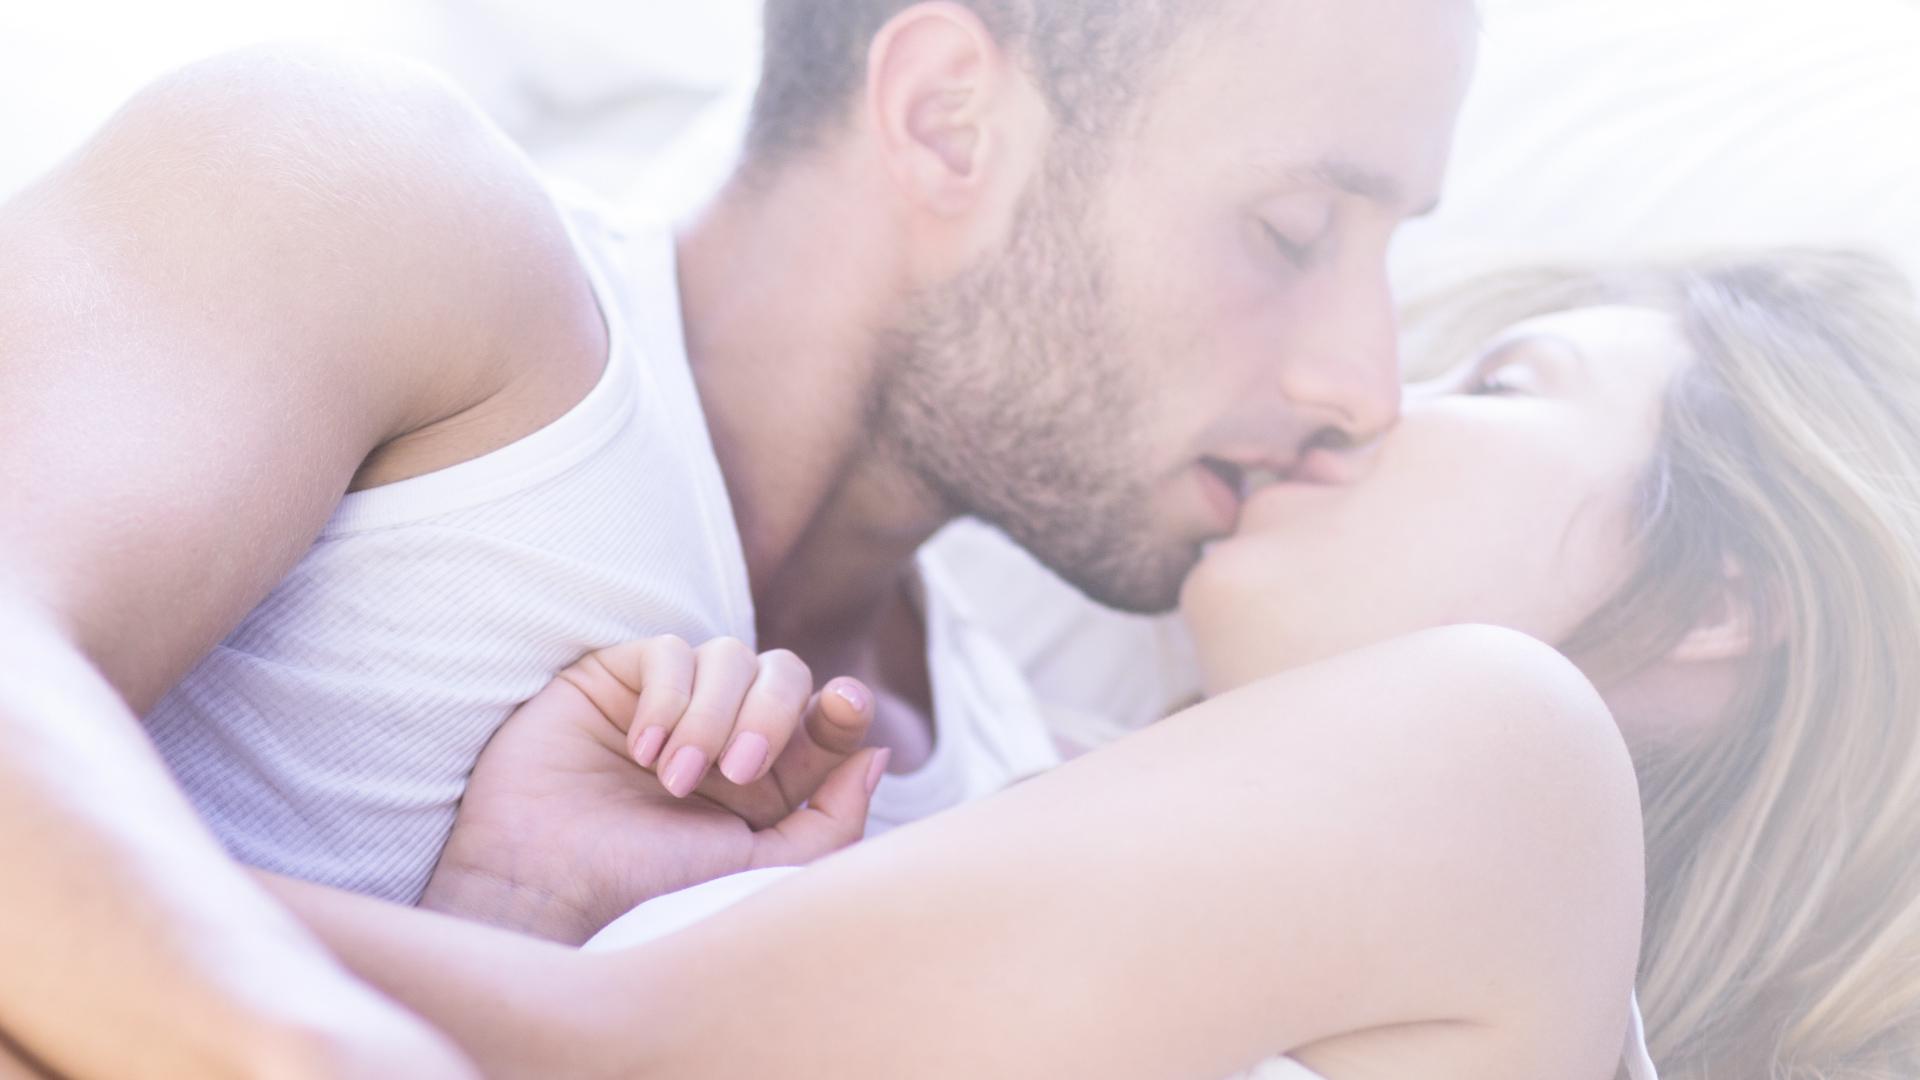 Порно по категориям